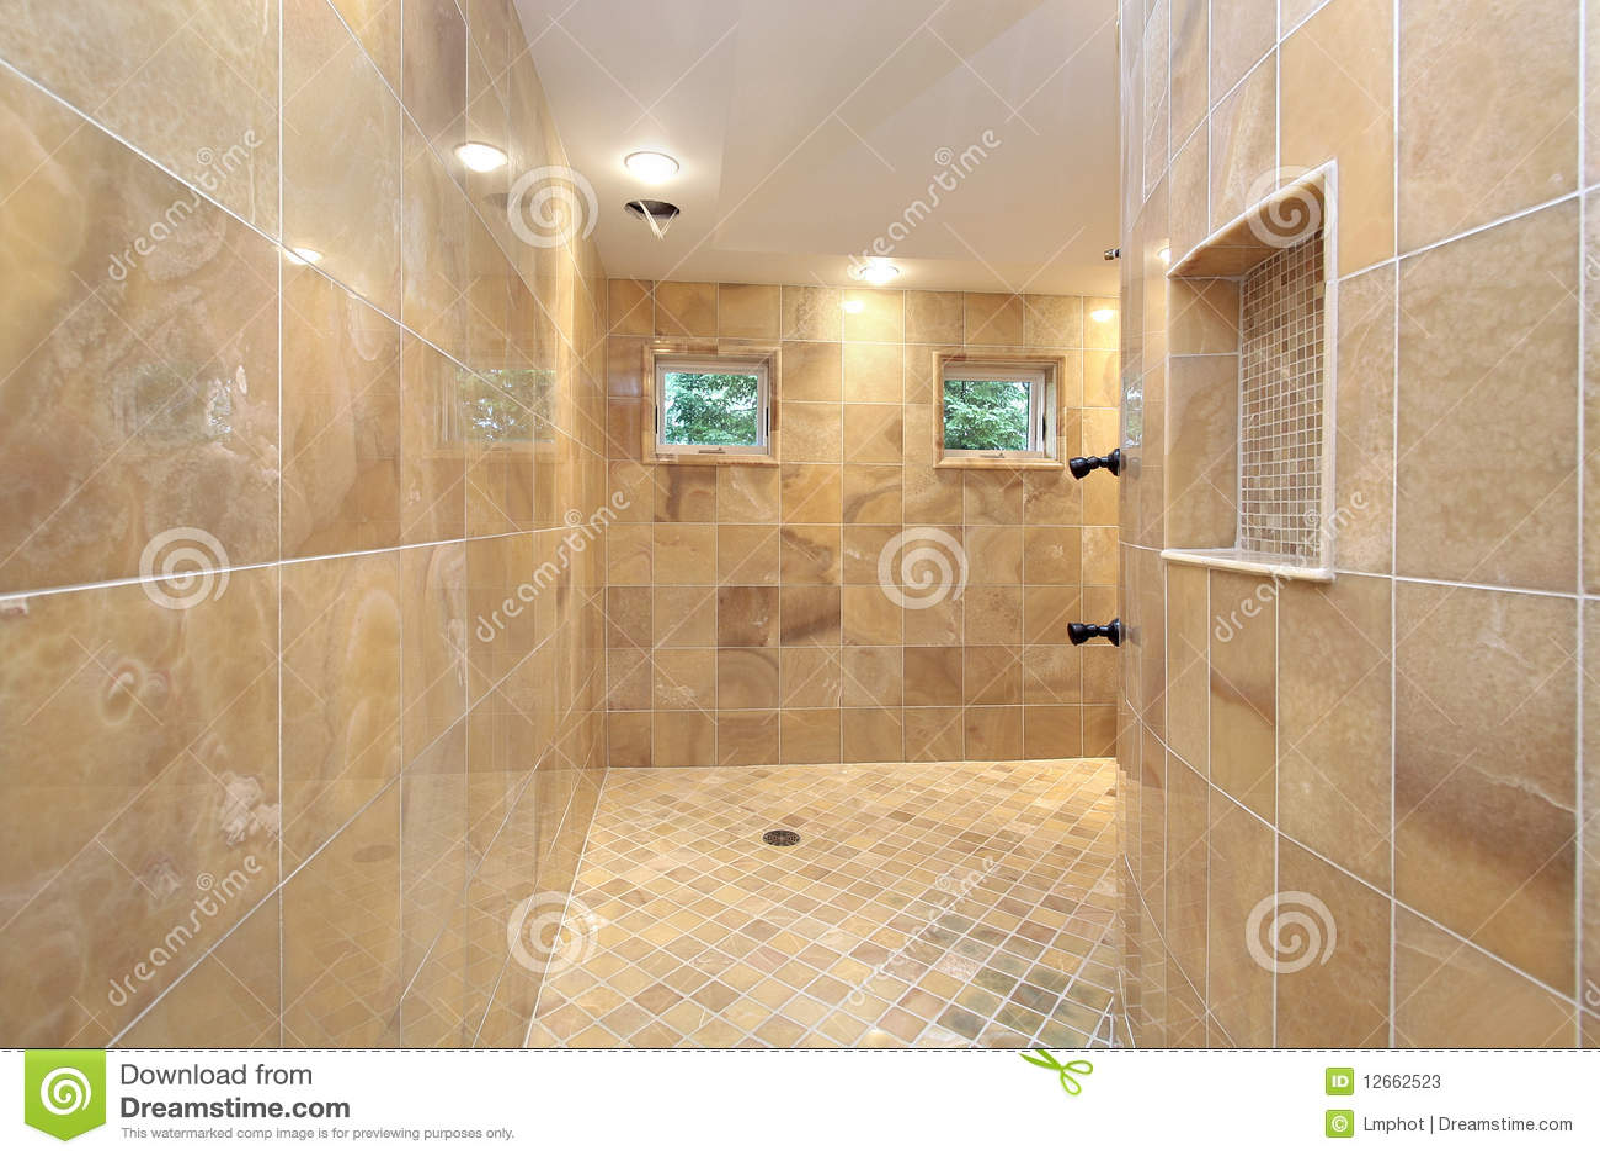 Bathroom Design 4 X 5